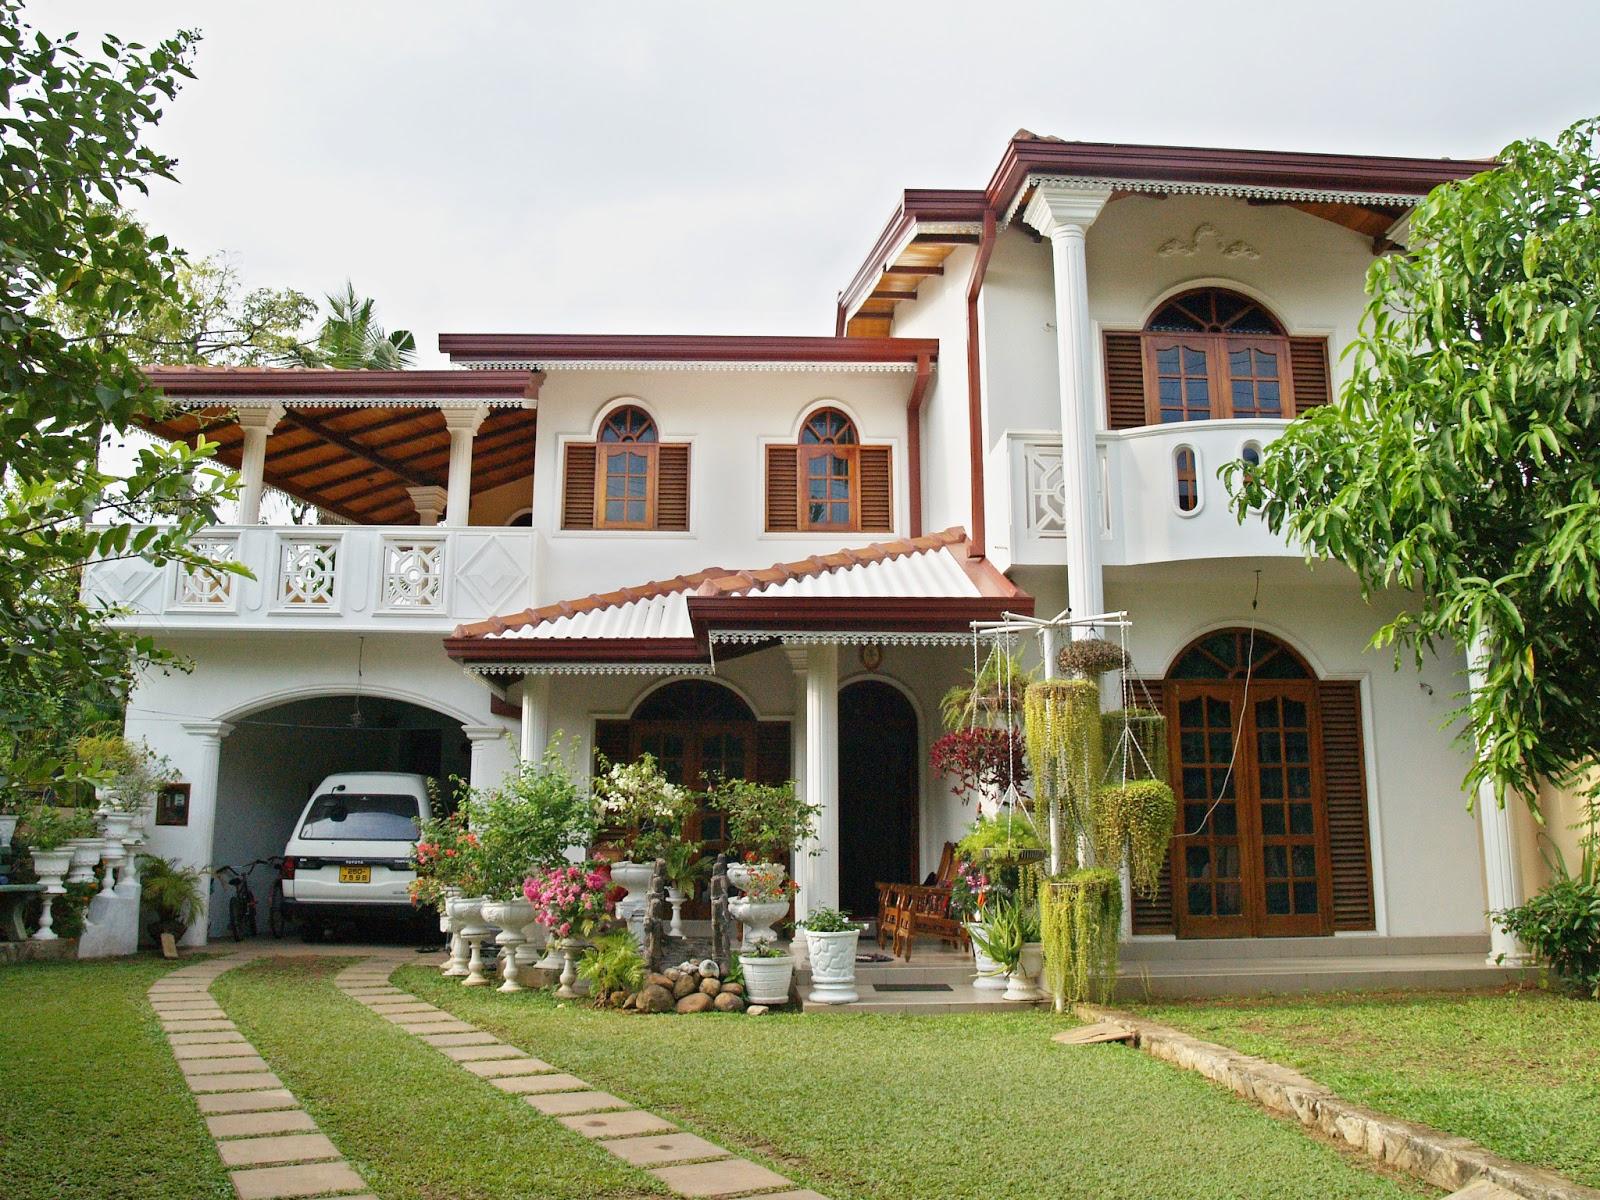 Home Plans In Sri Lanka - Zion Star - Zion Star